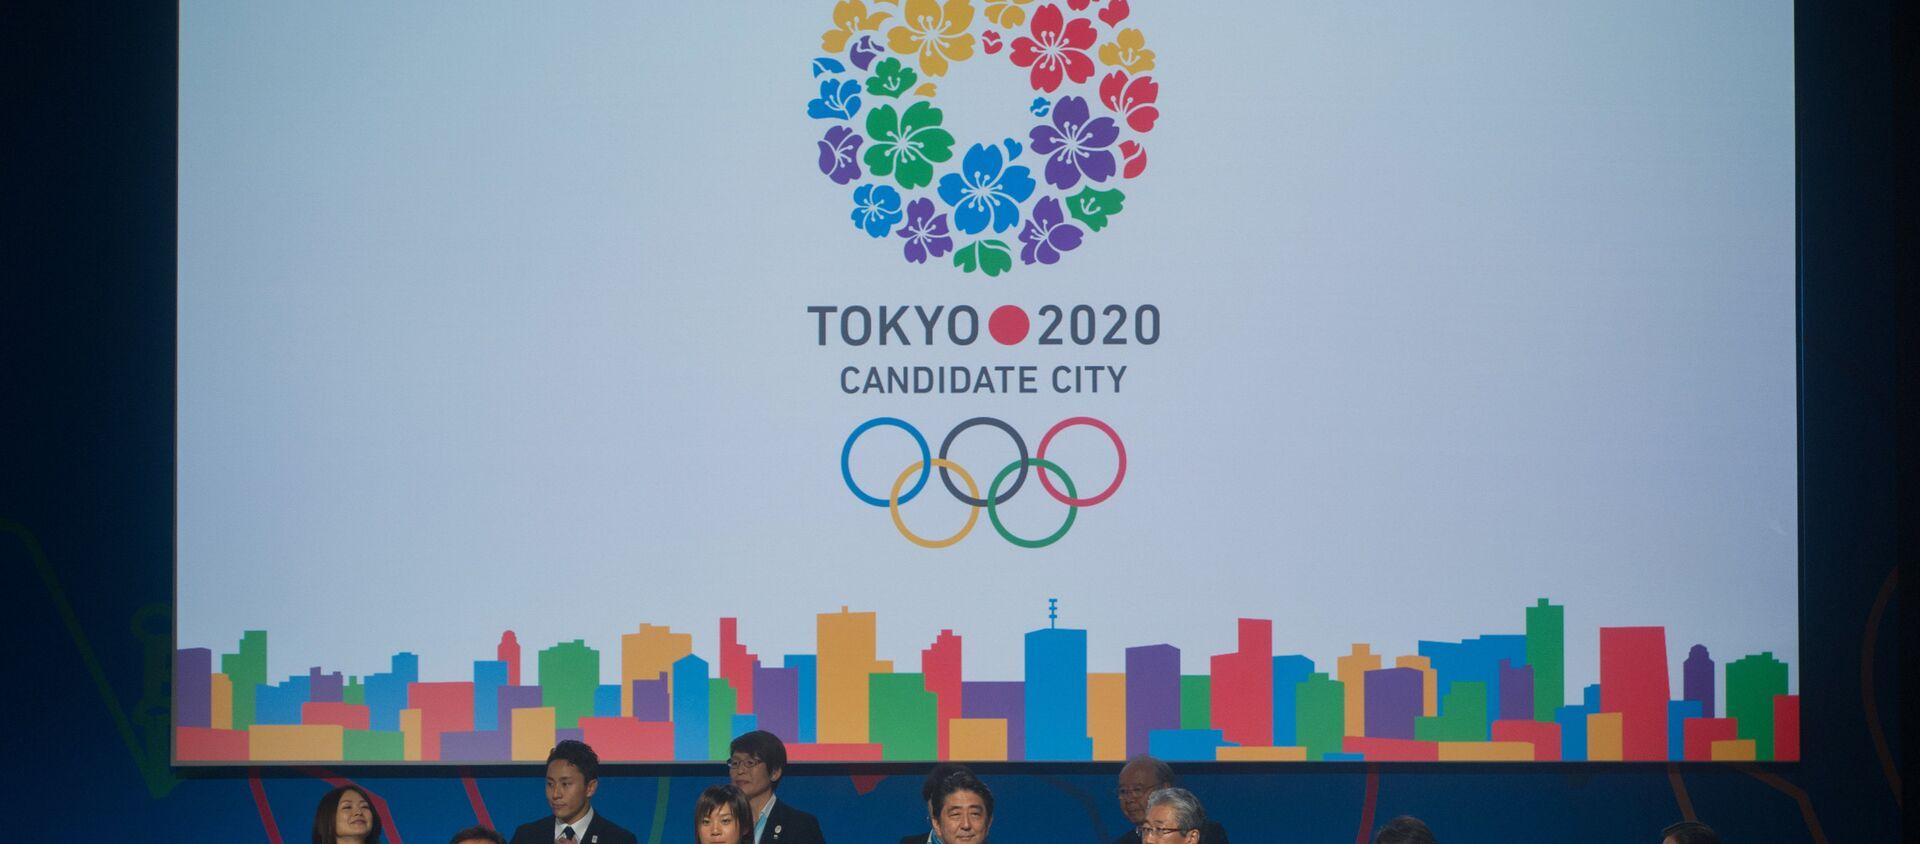 日本、東京五輪で要人随行員の人数制限を要請 - Sputnik 日本, 1920, 21.03.2021